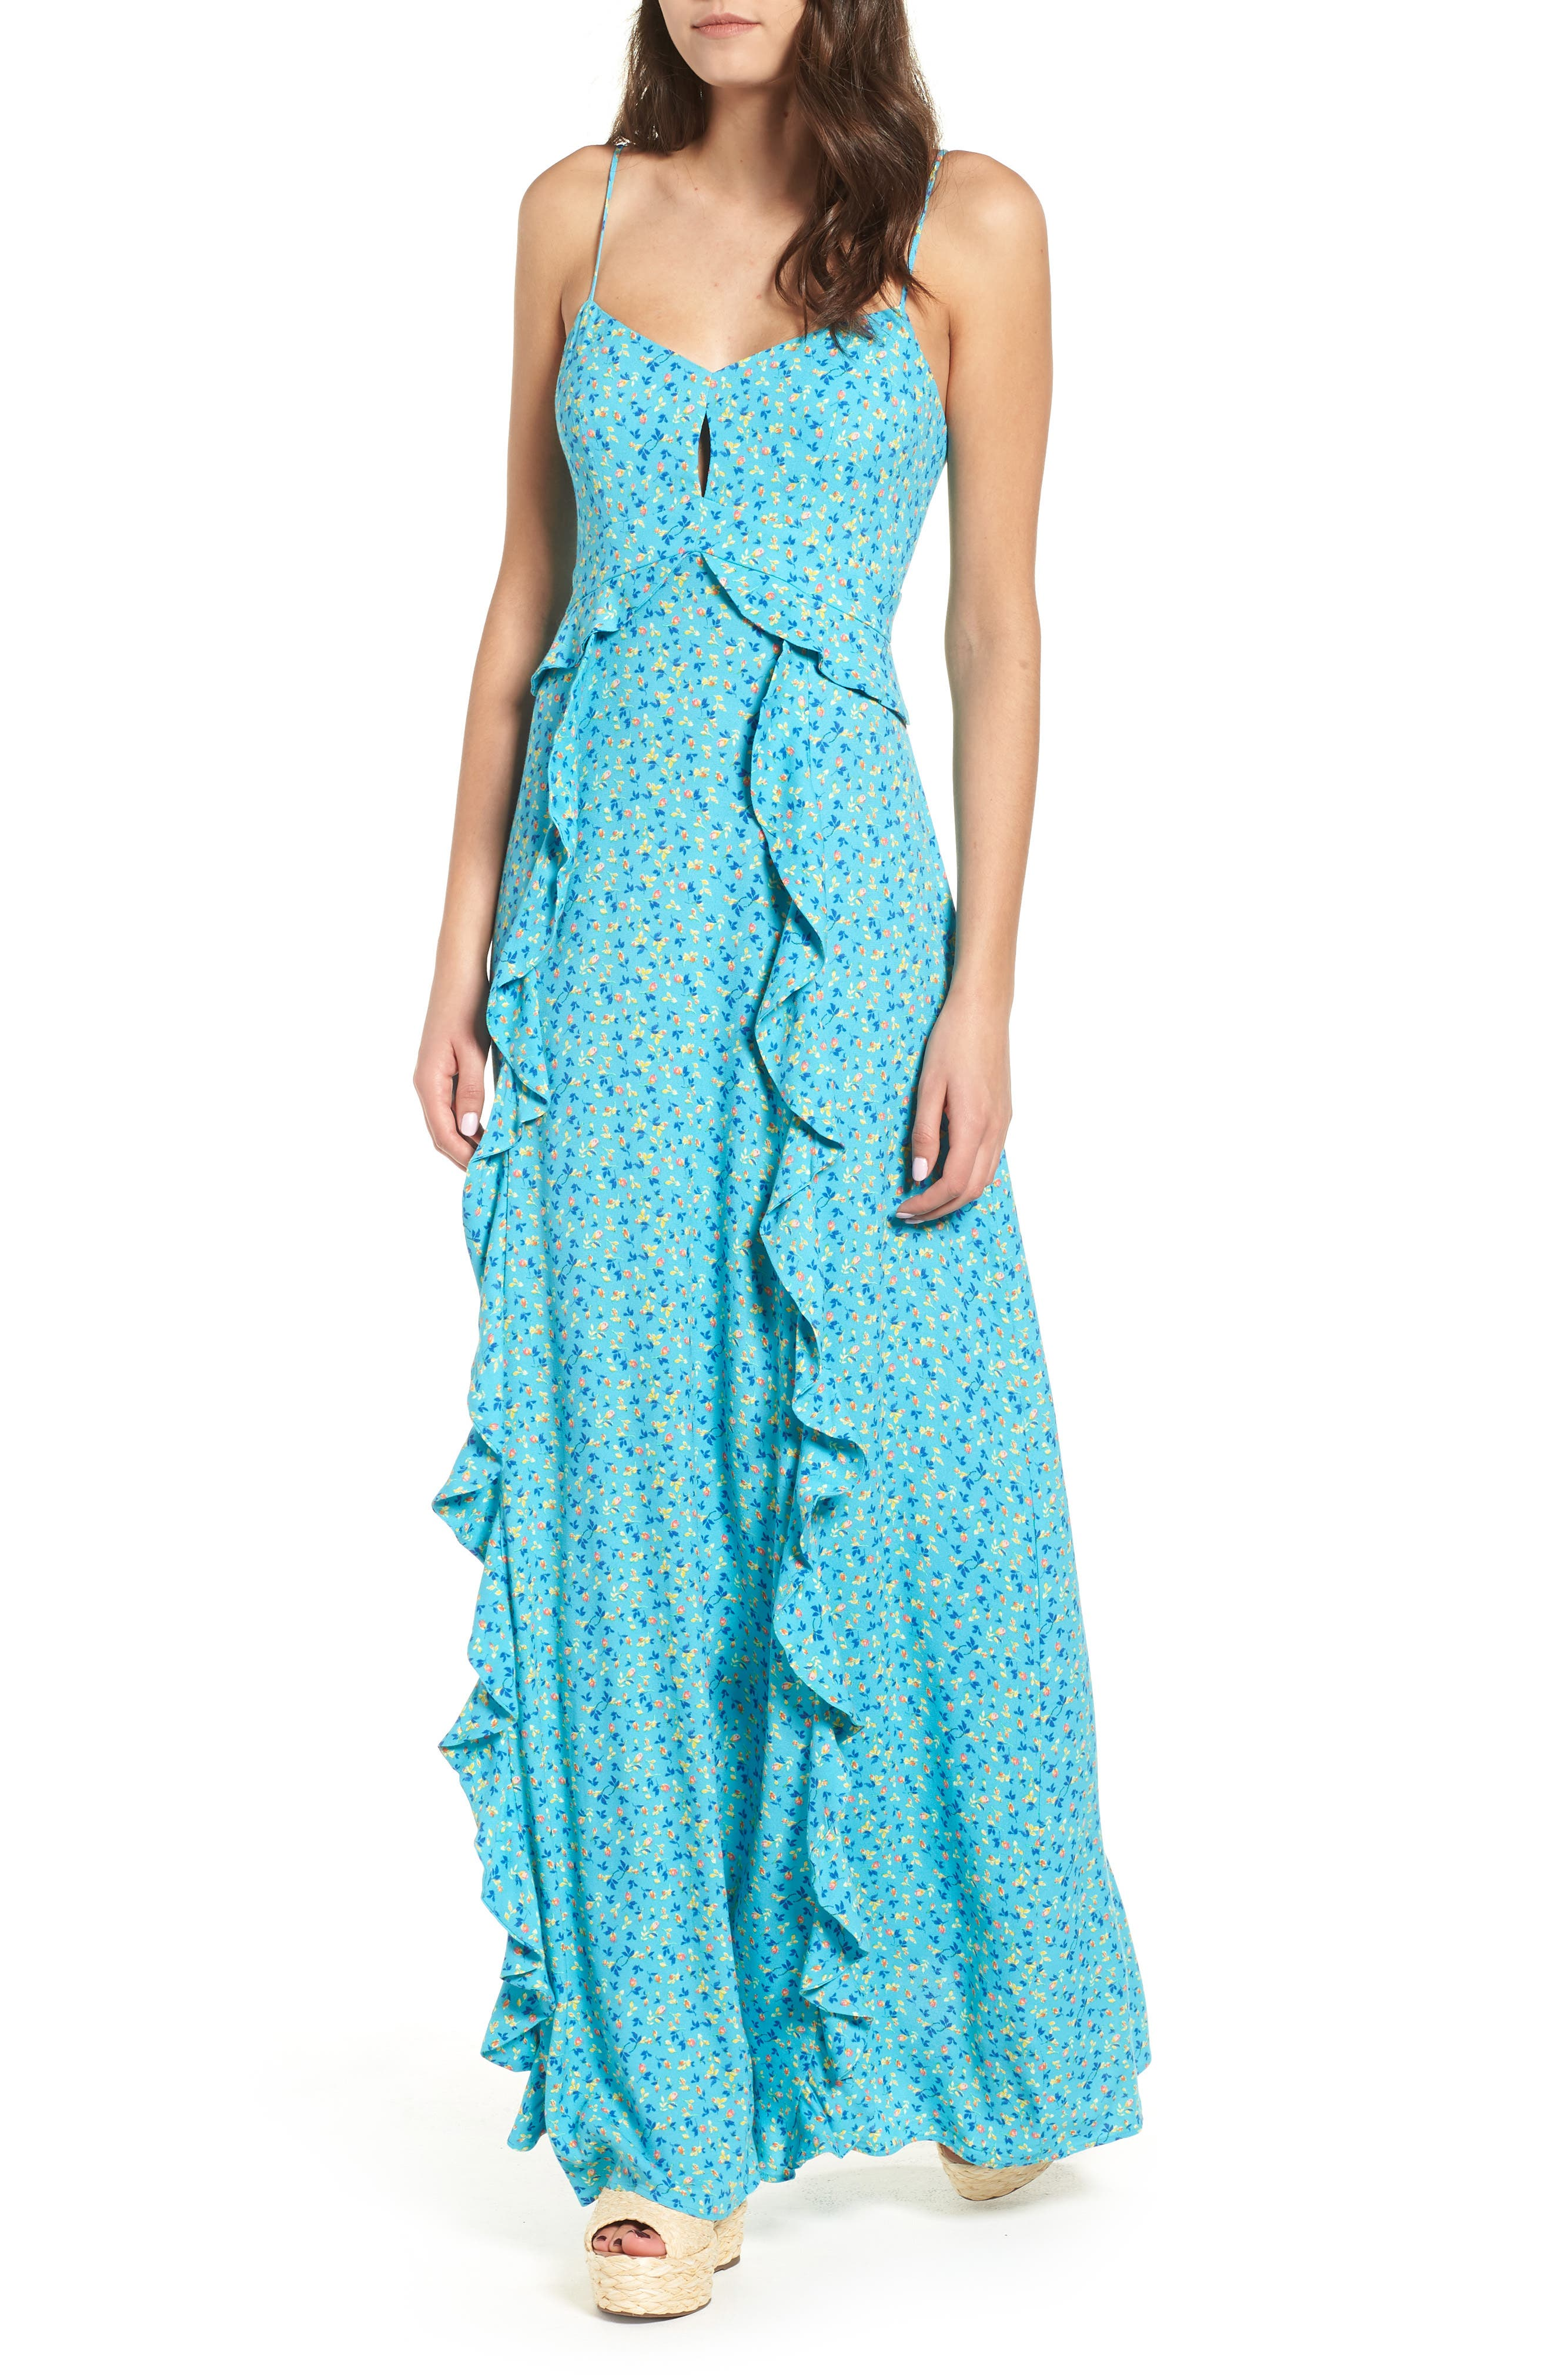 Kiki Ruffle Maxi Dress,                             Main thumbnail 1, color,                             400